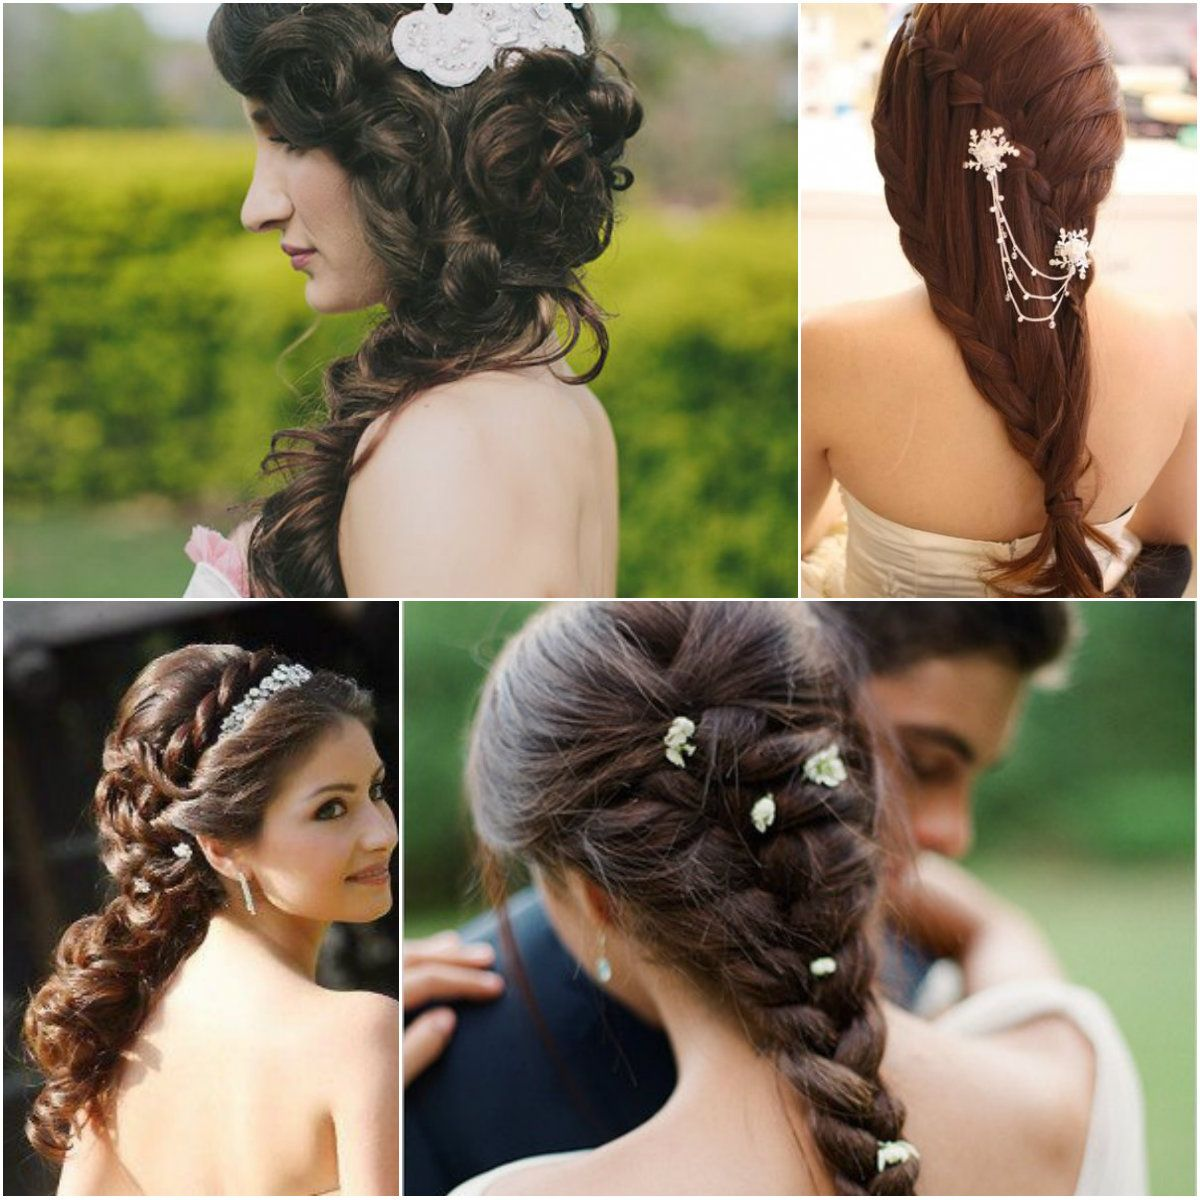 stylish #braids hairstyles